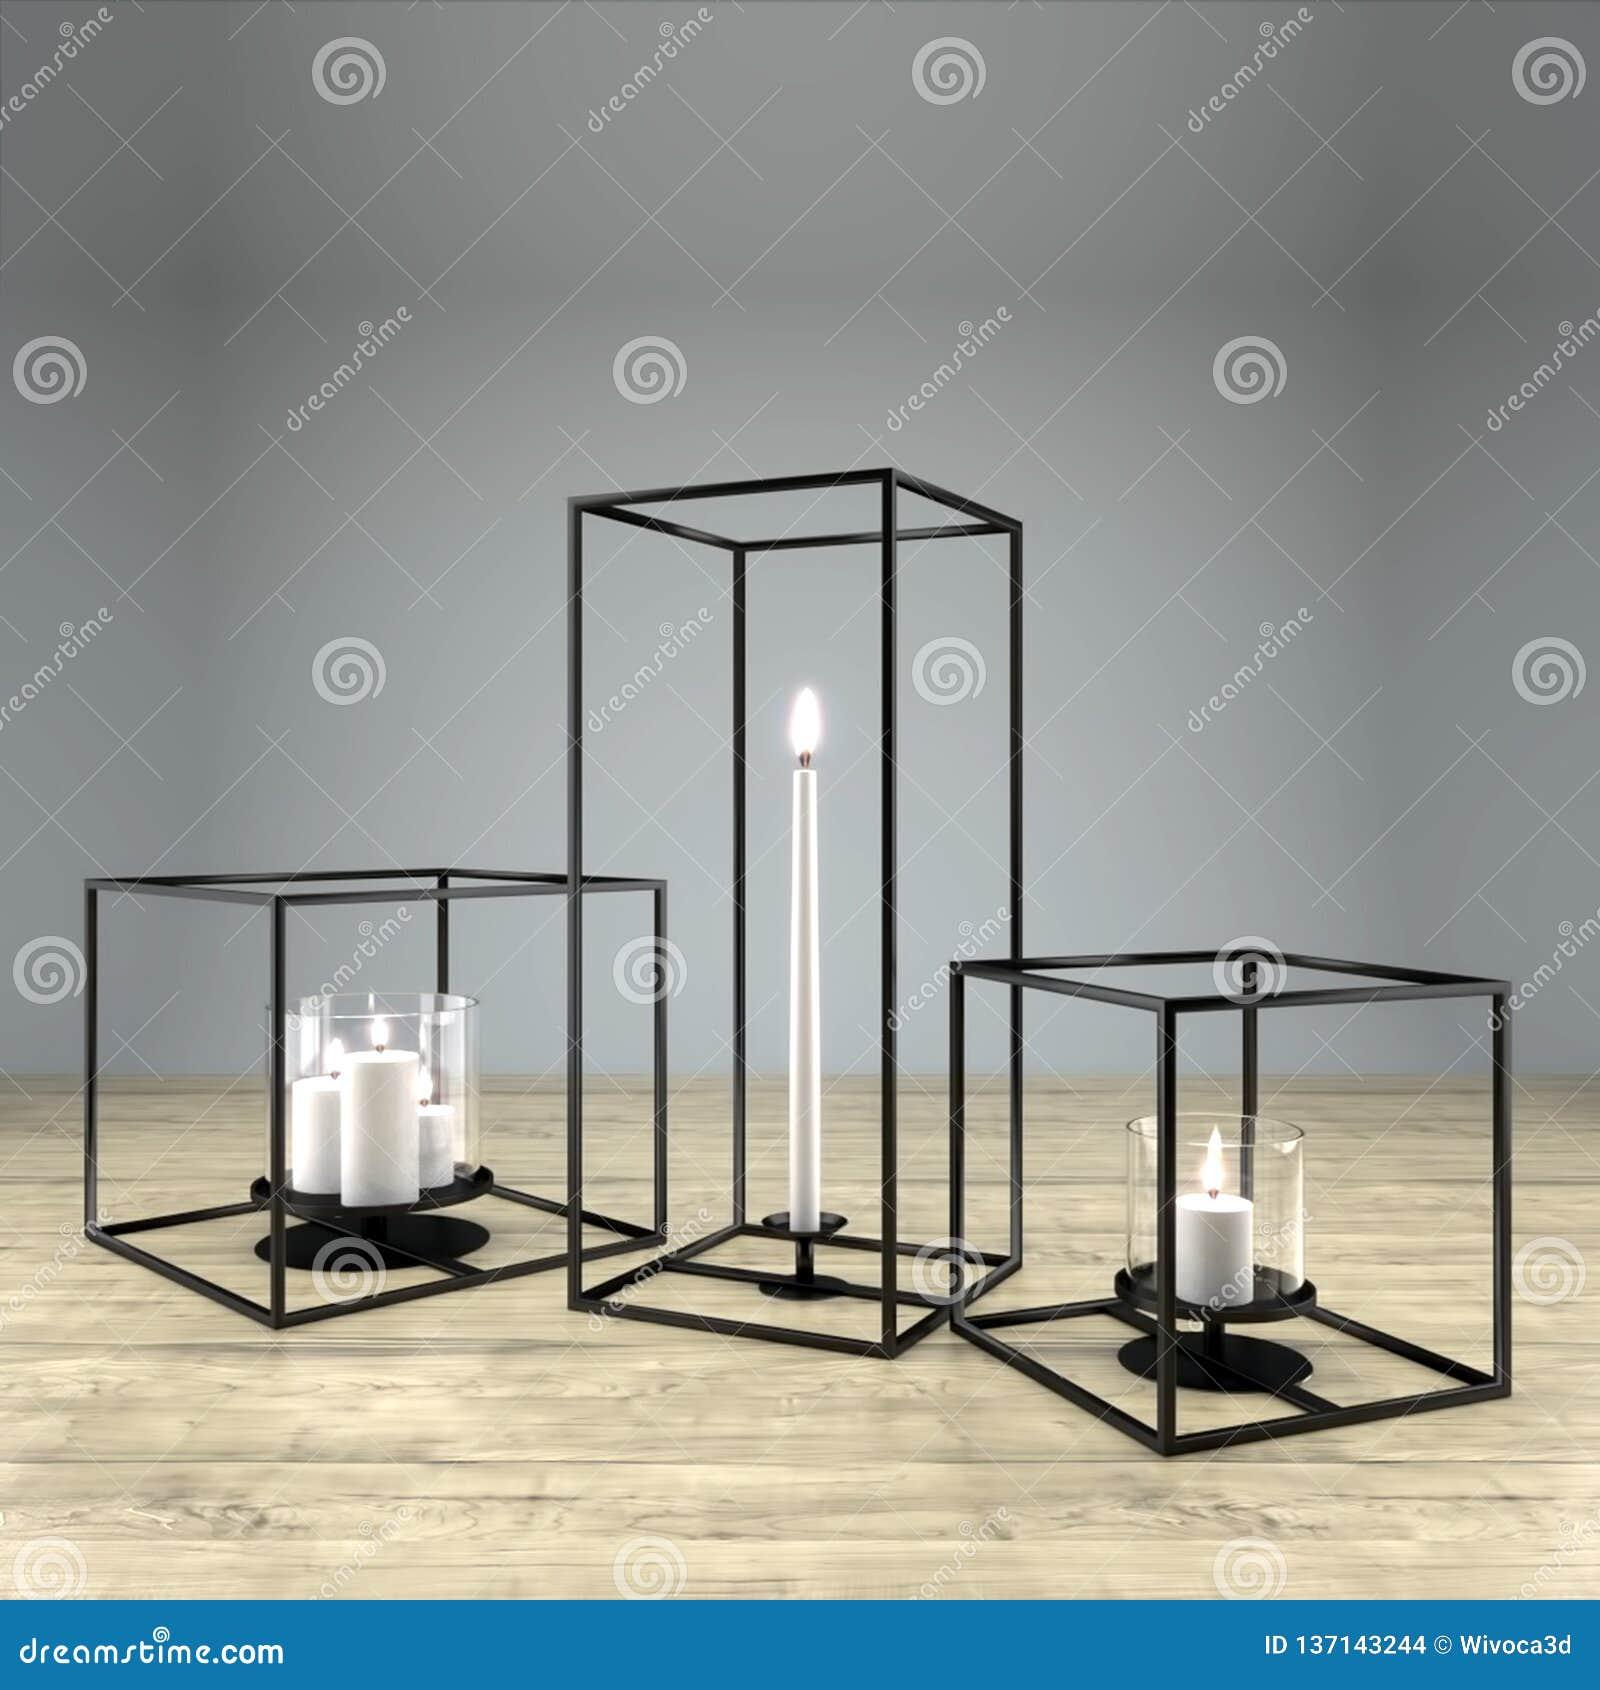 Picture of: Modern Rectangular Metal Framed Candle Holder Stock Illustration Illustration Of Decorative Cube 137143244